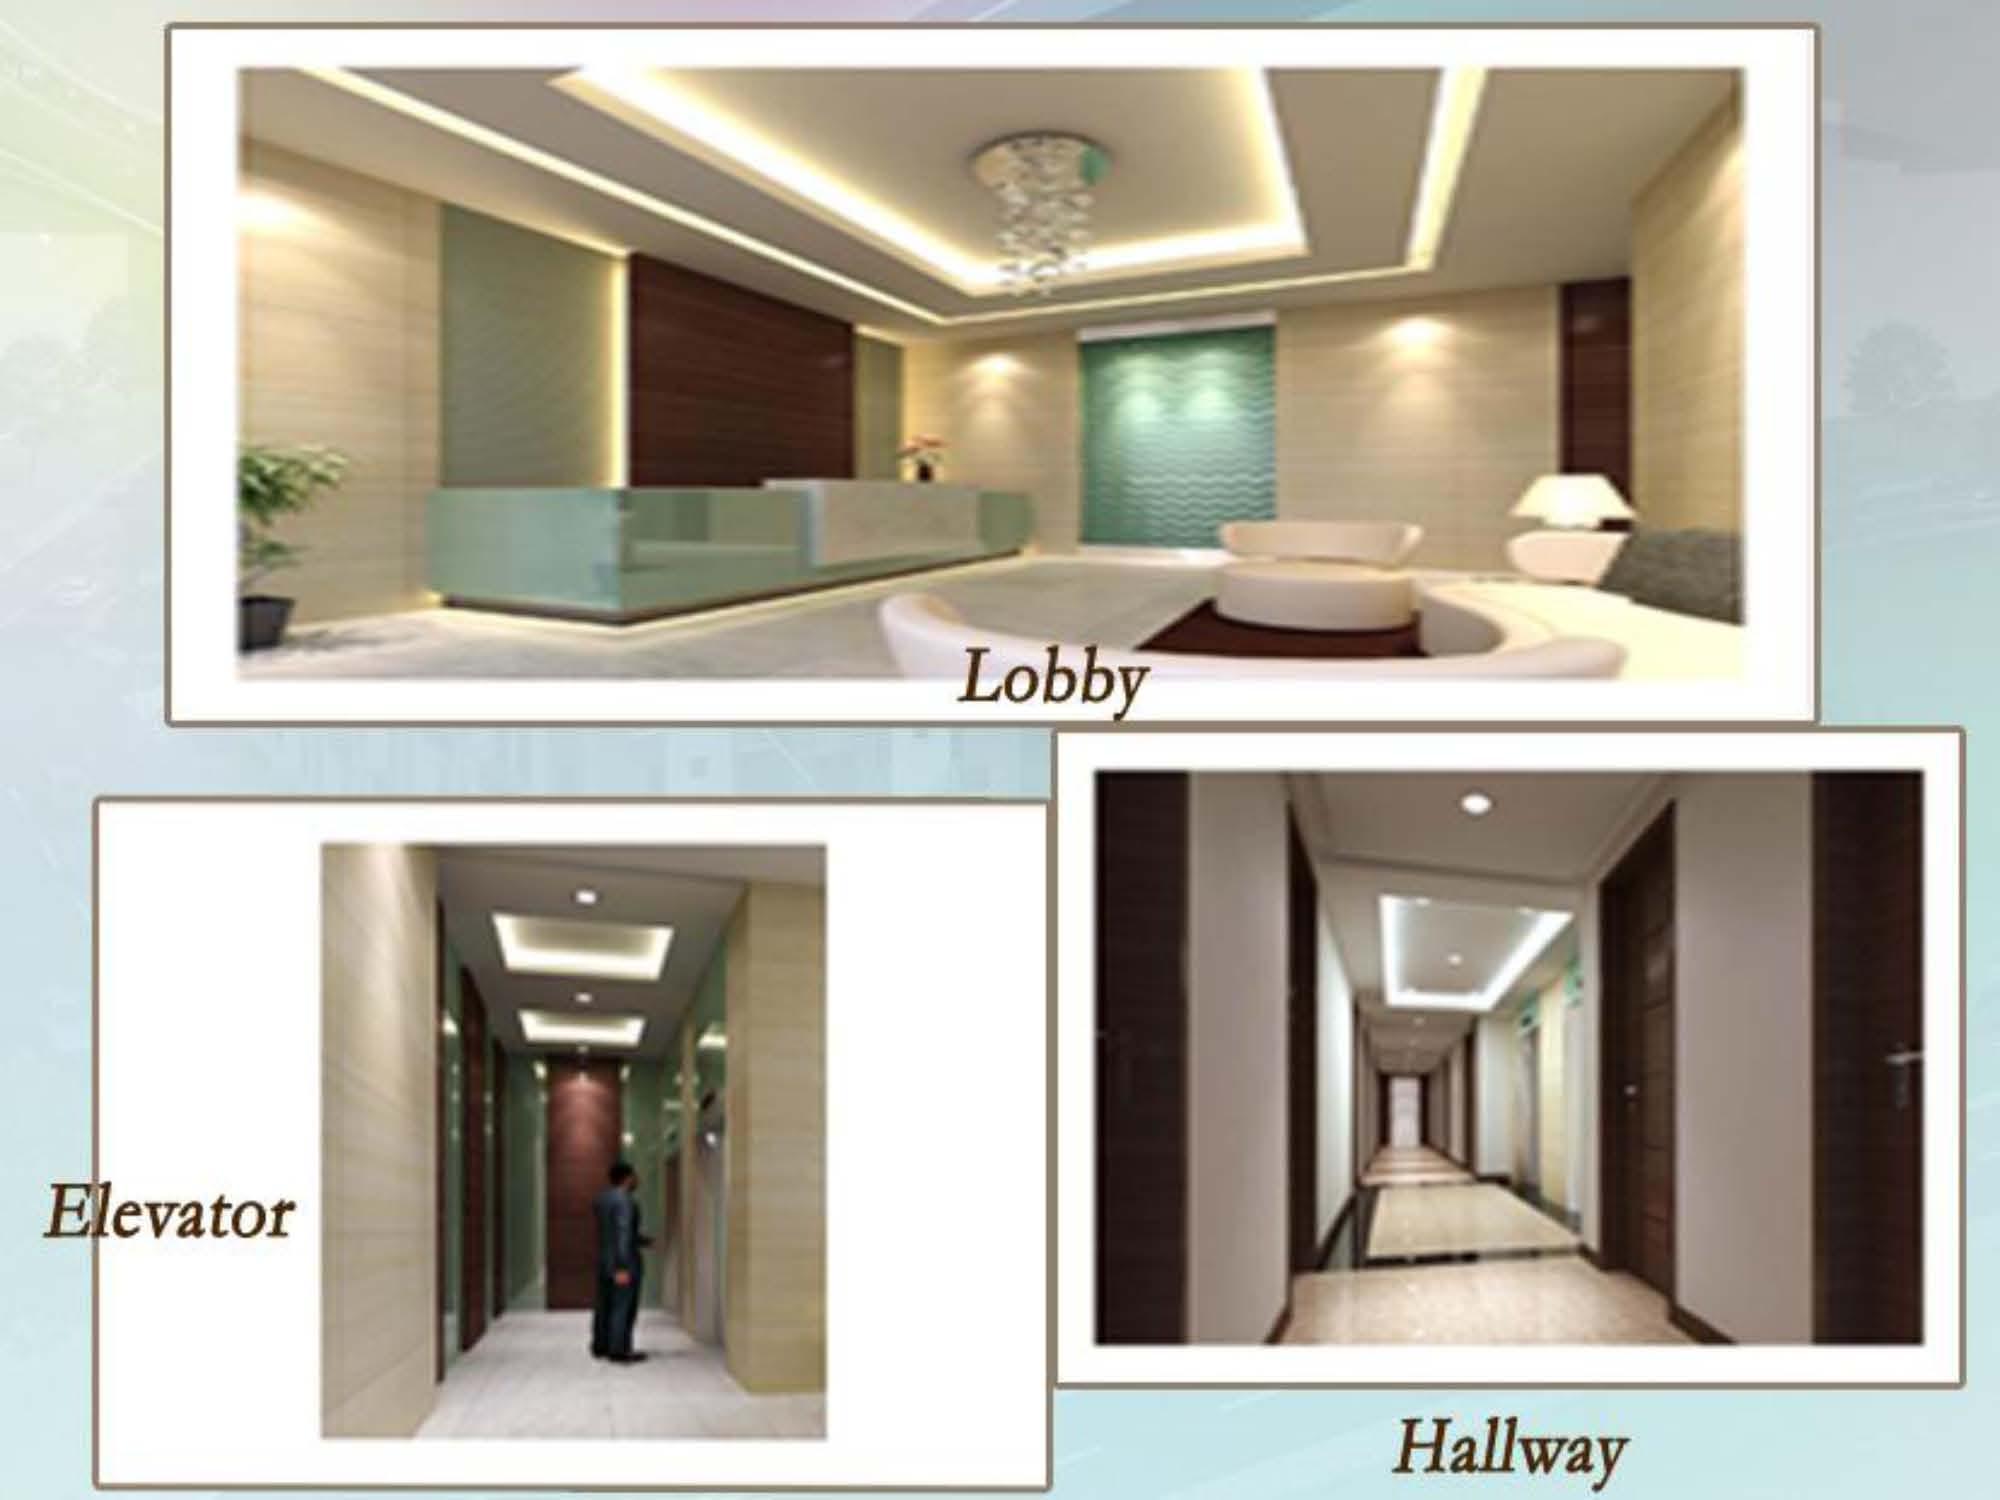 Elevator, Lobby, Hallway